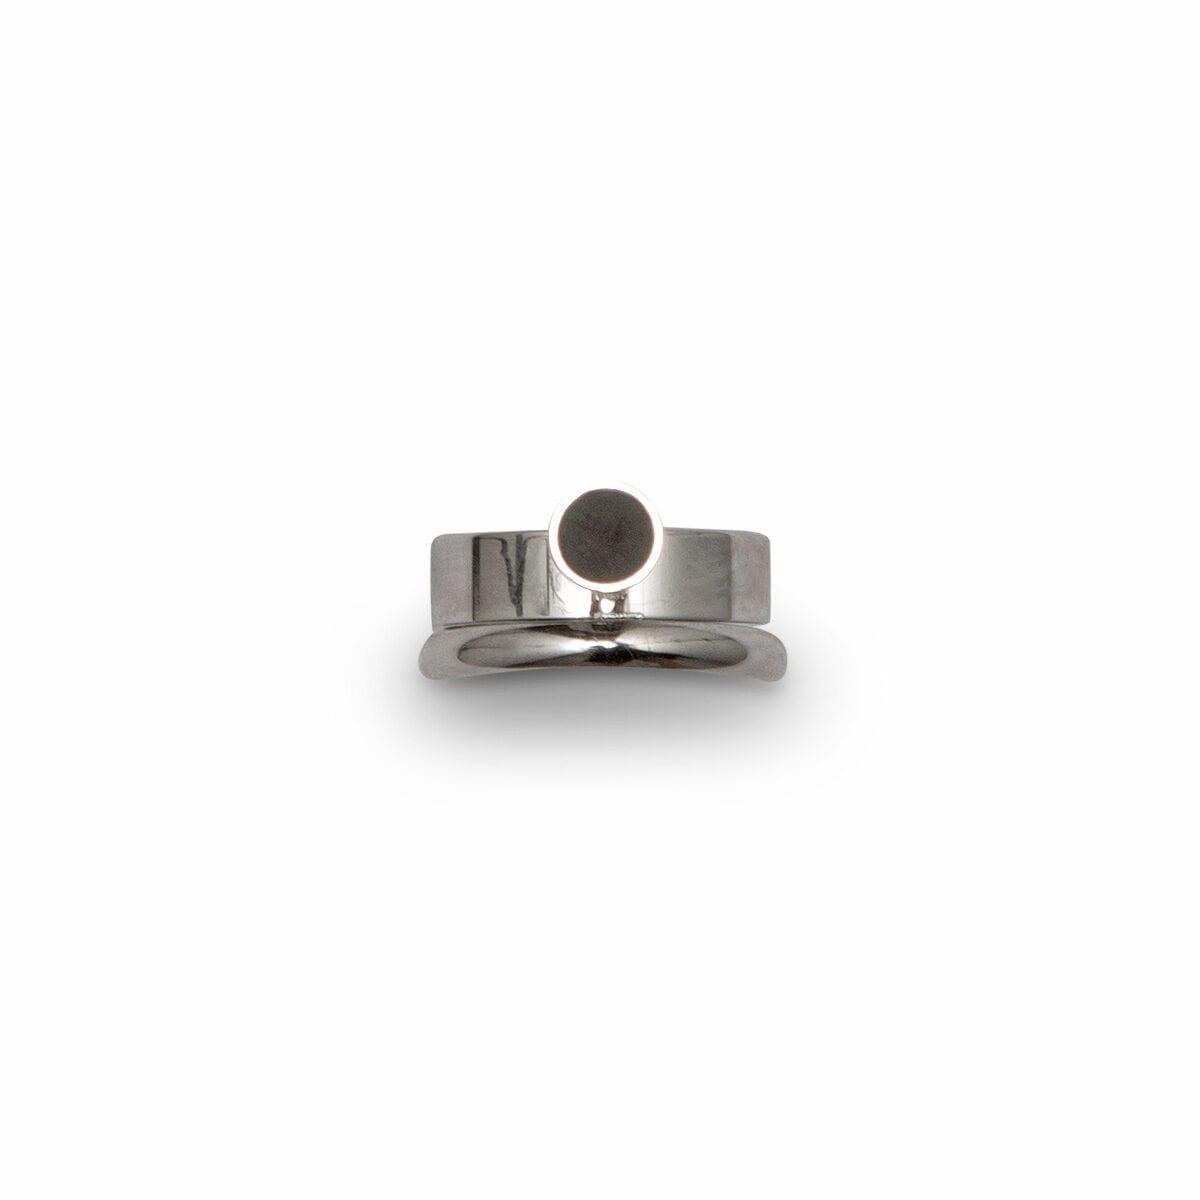 1200x1200_ST12R!_Satellite-R1-Ring_595kr_62€